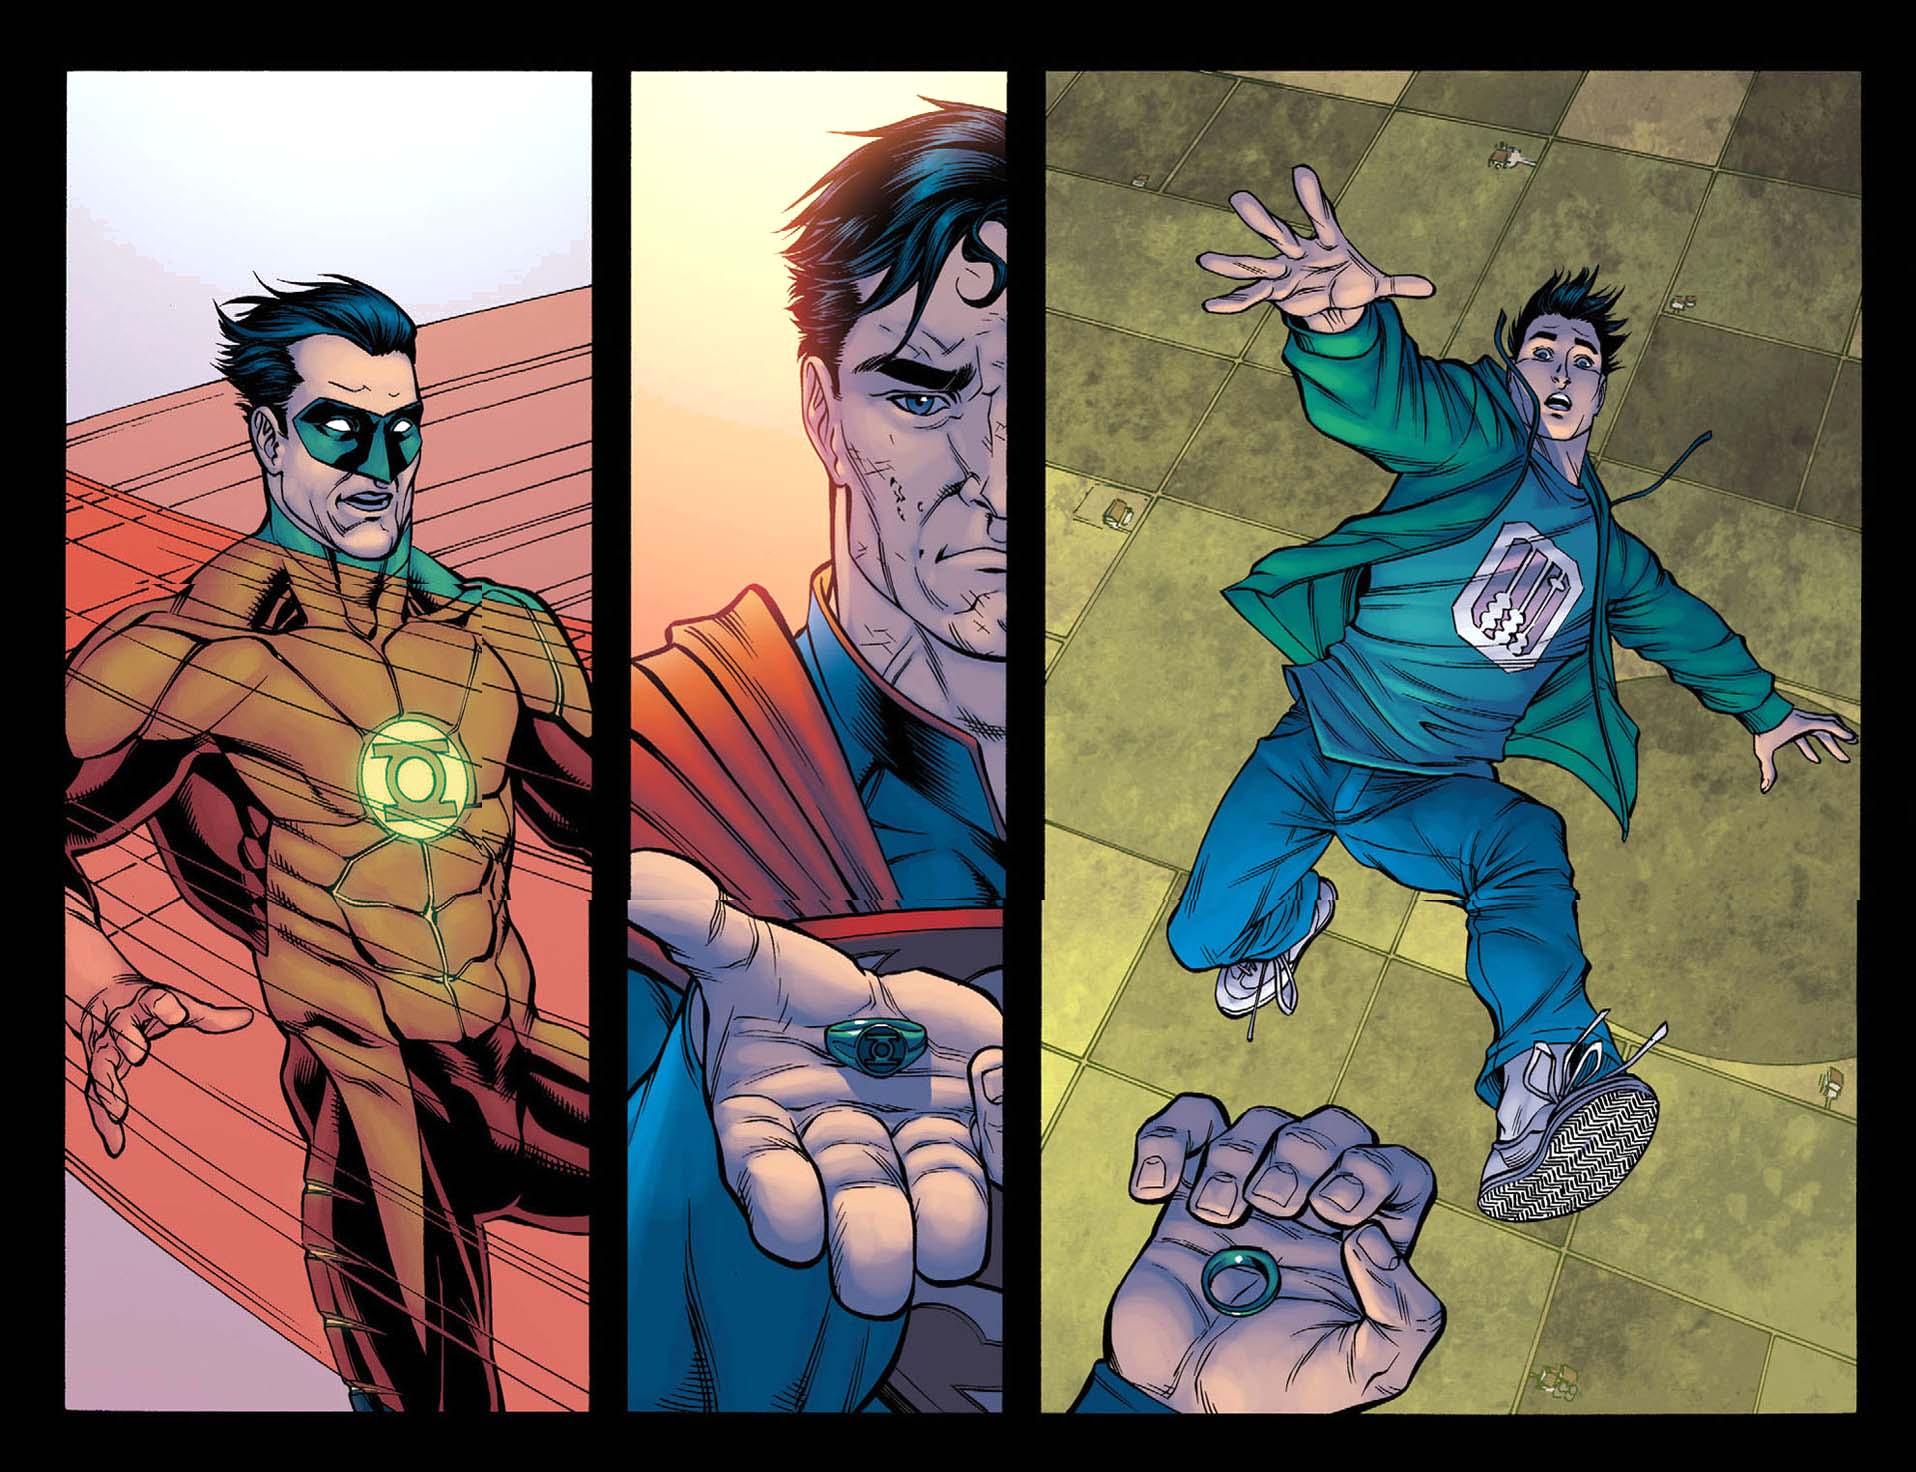 Superman vs green lantern - photo#24